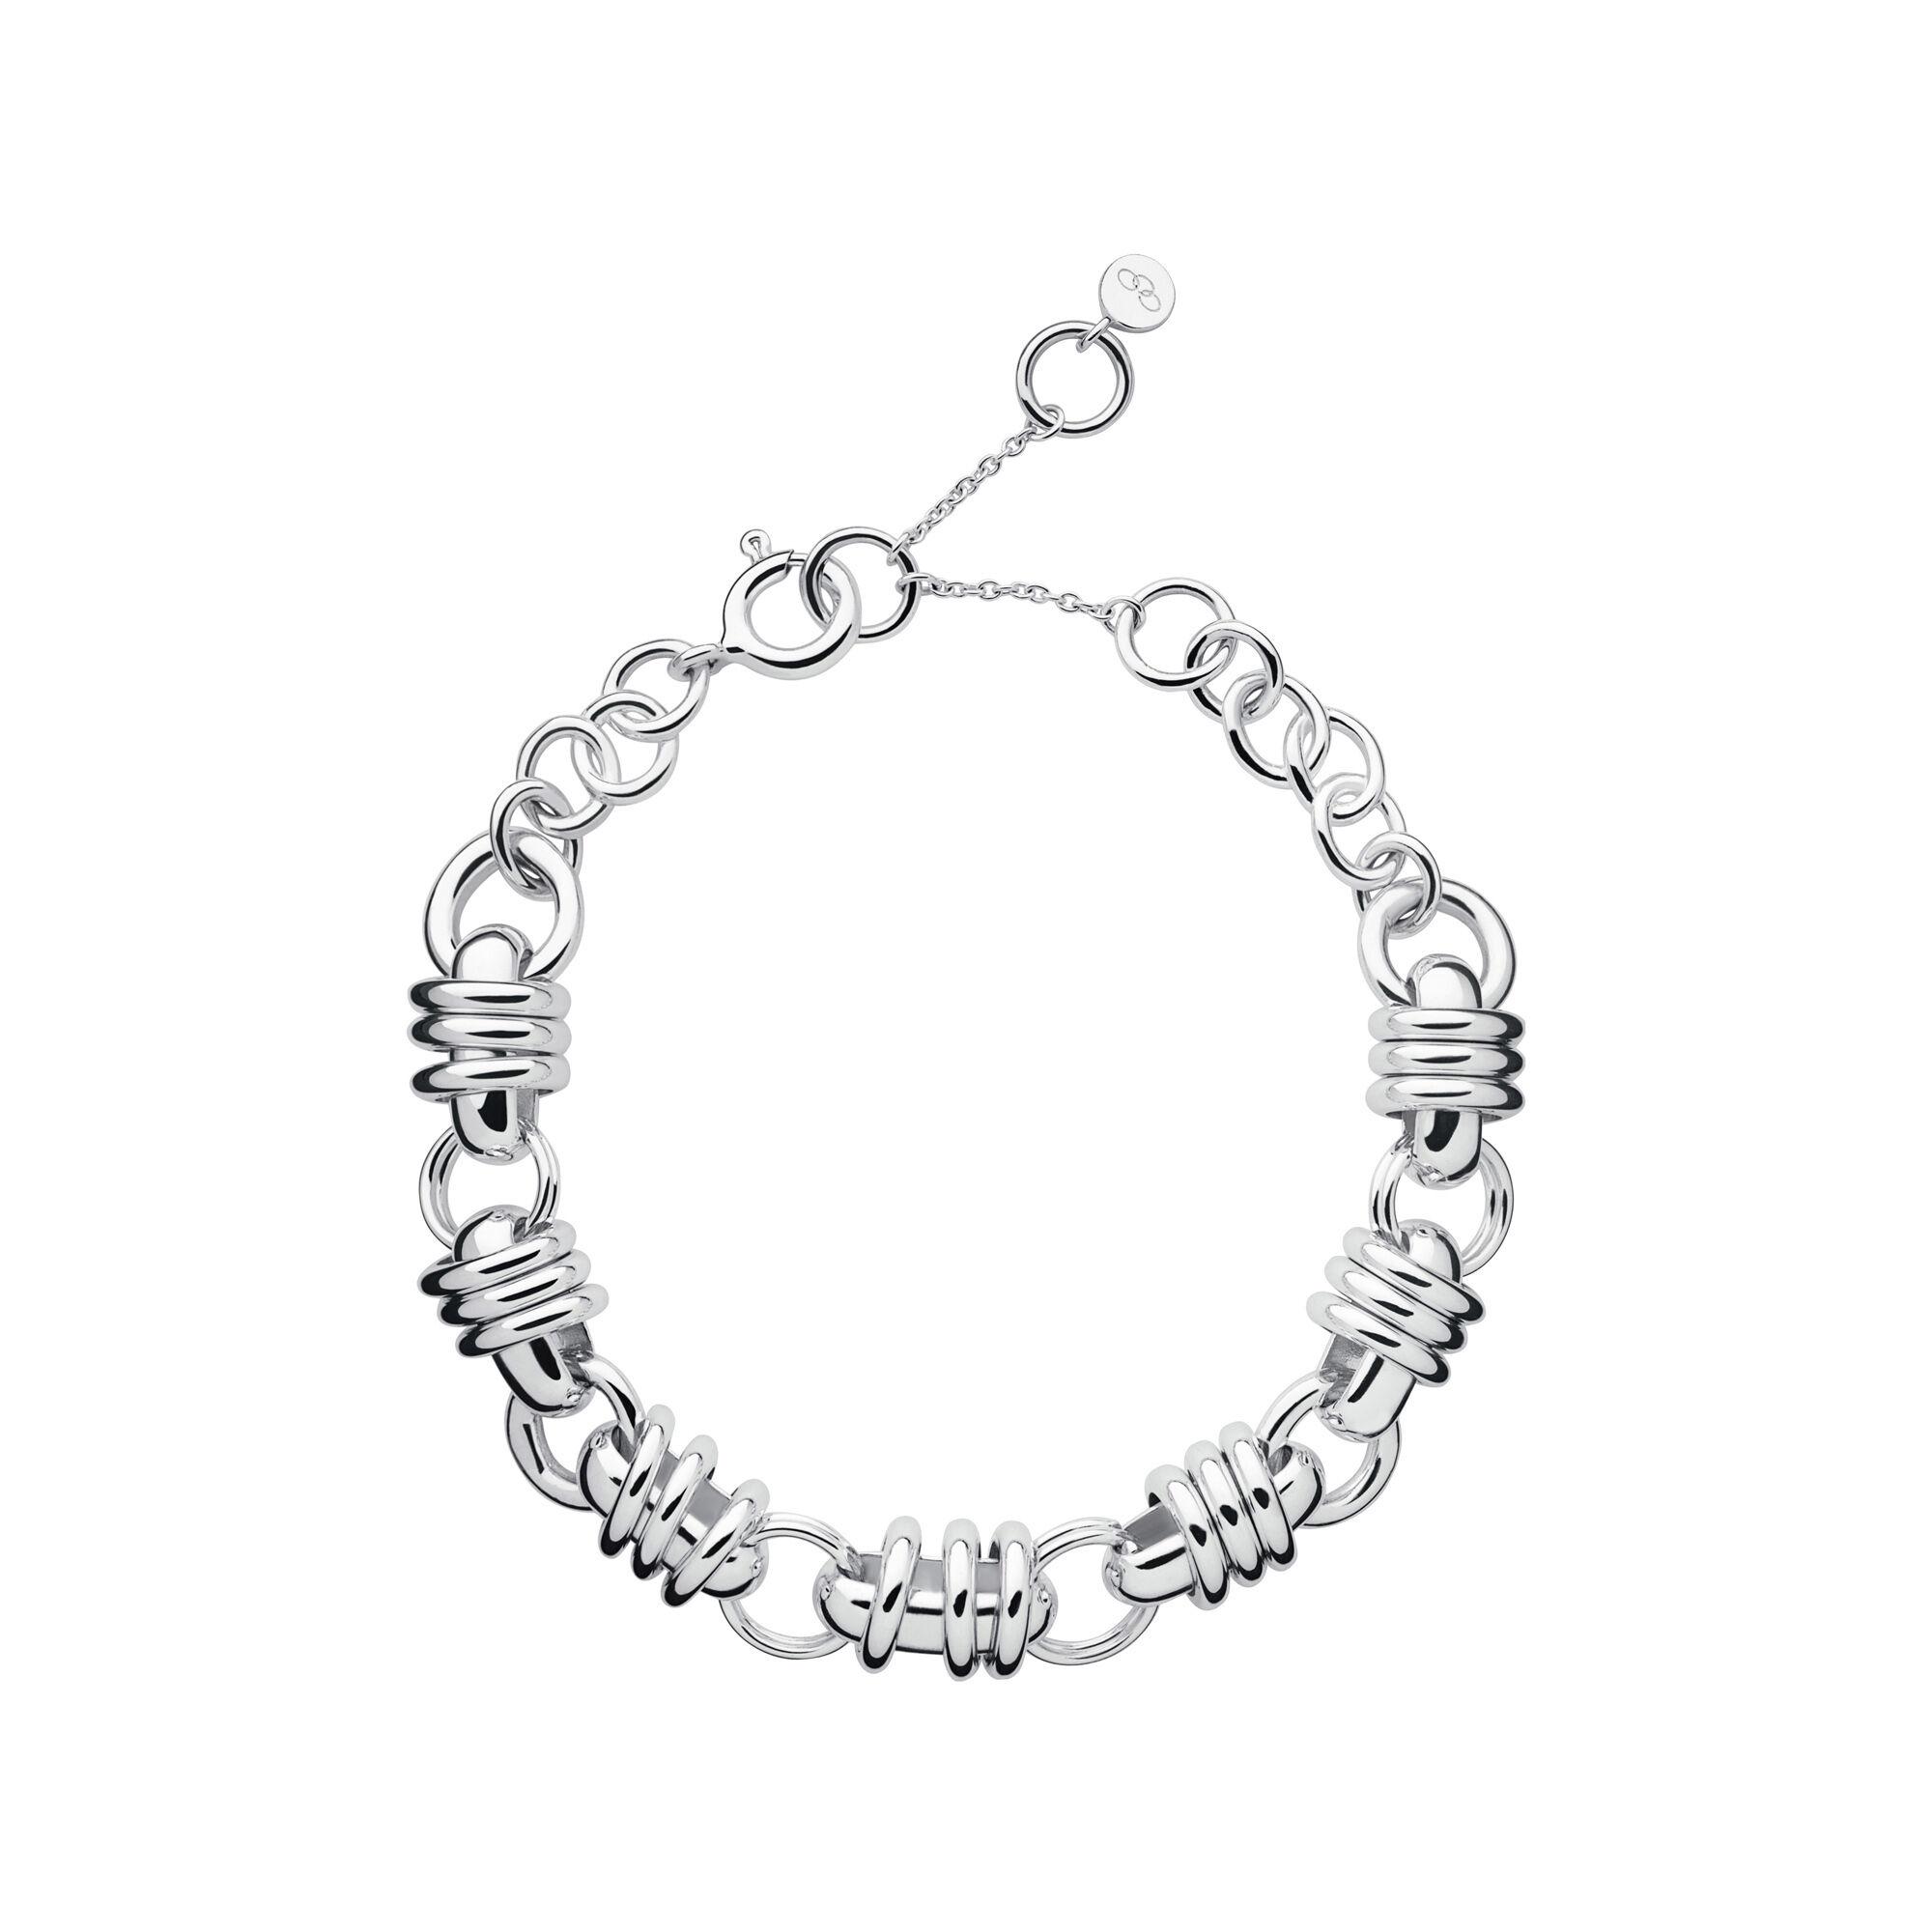 Sweetie Silver Chain Charm Bracelet